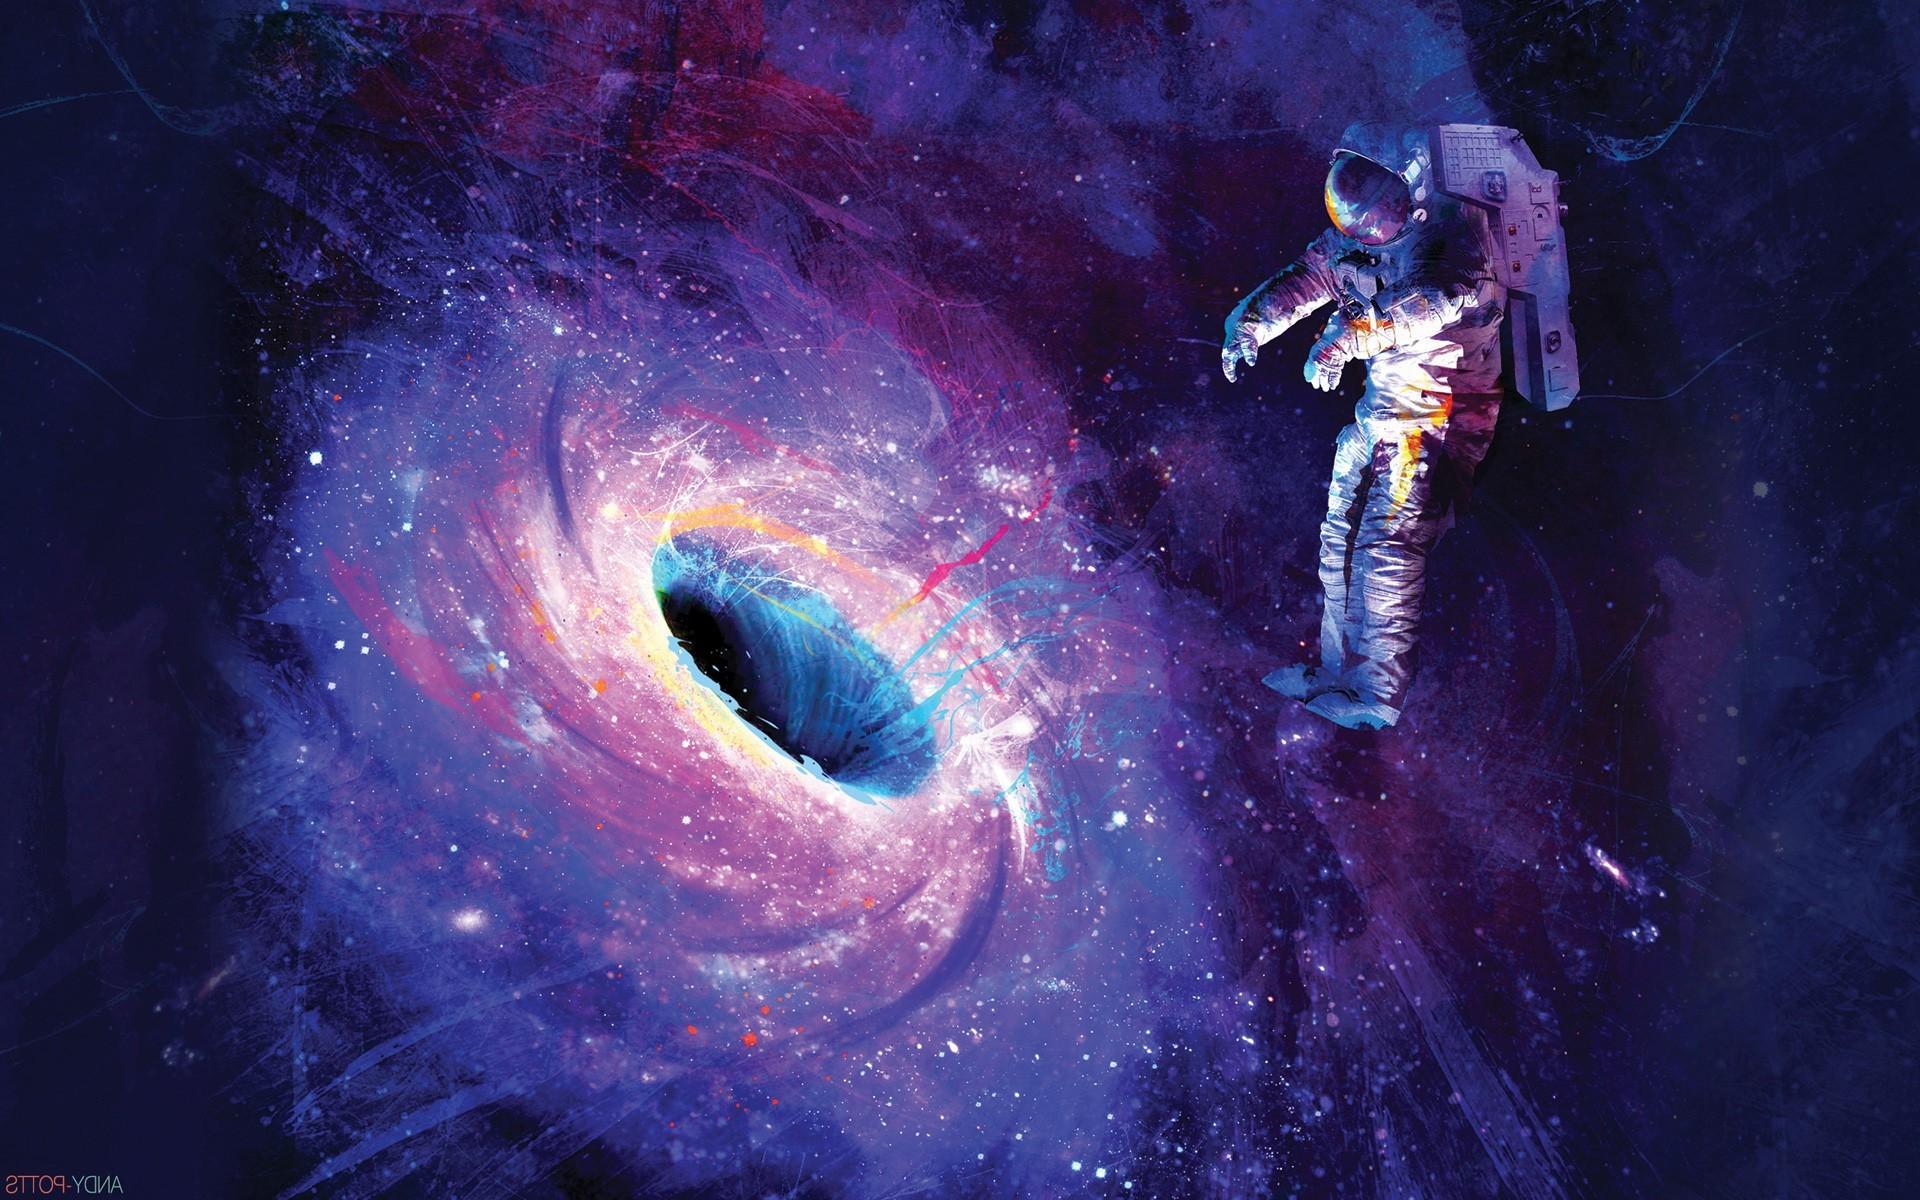 Wallpaper 1920x1200 Px Artwork Astronaut Black Holes Digital